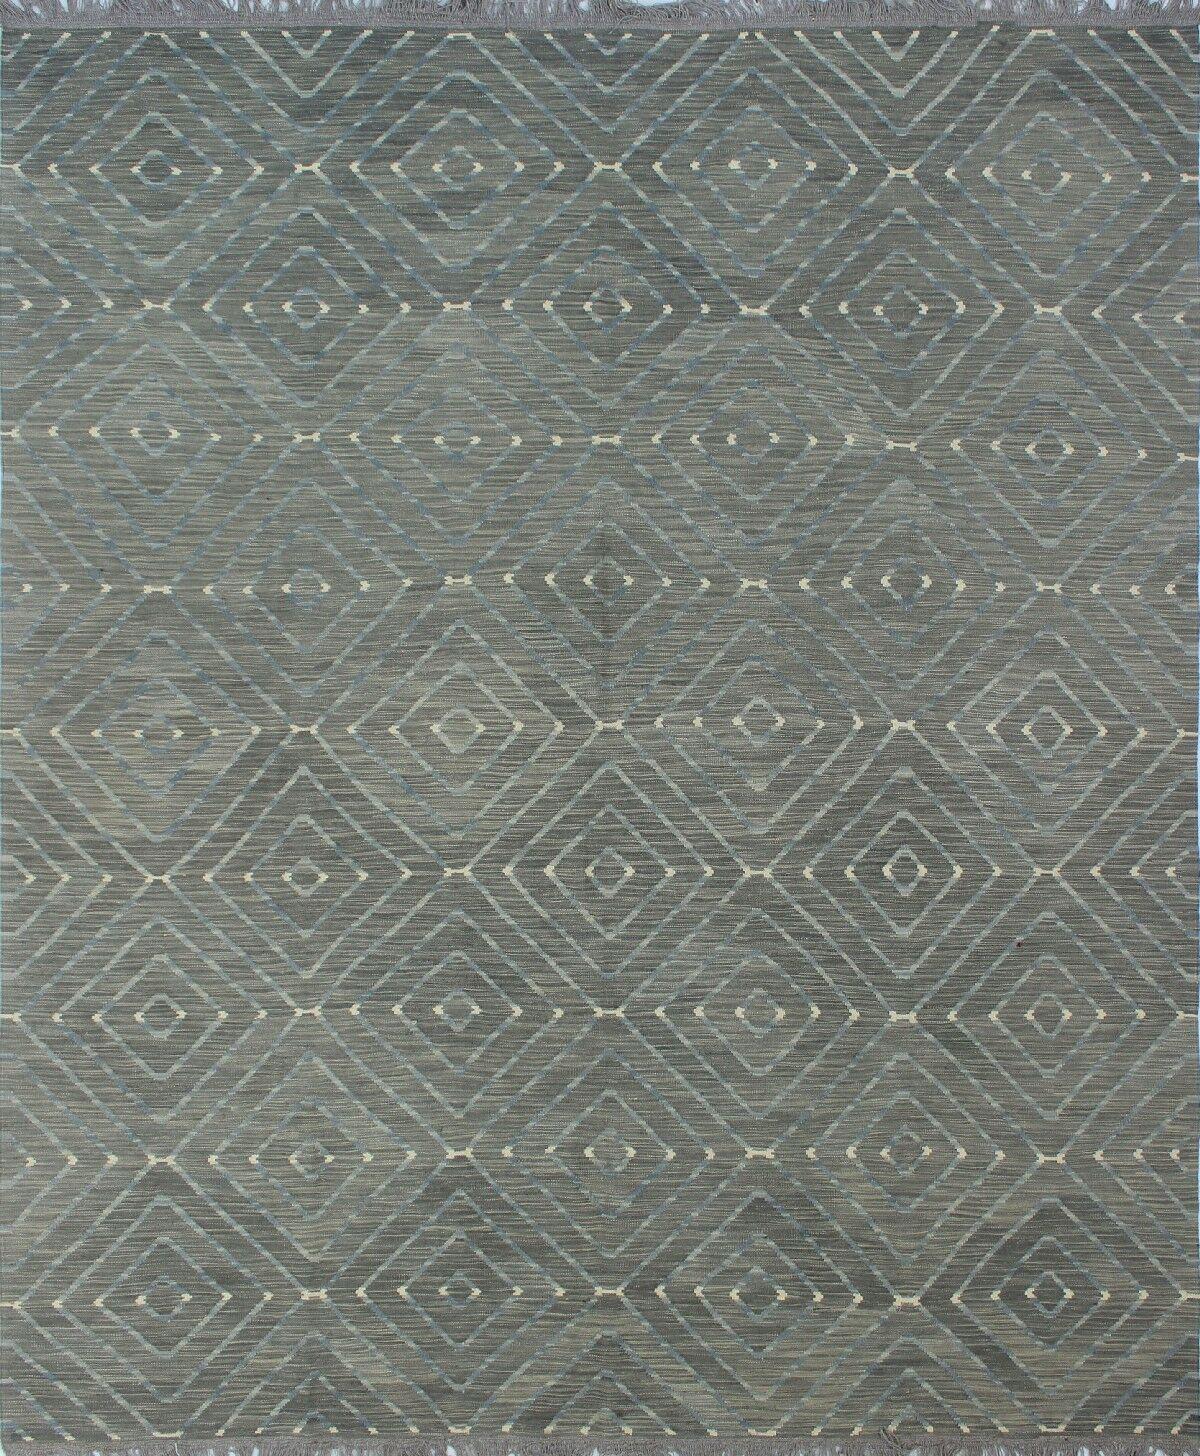 Ackworth Kilim Hand Woven Wool Rectangle Gray Area Rug